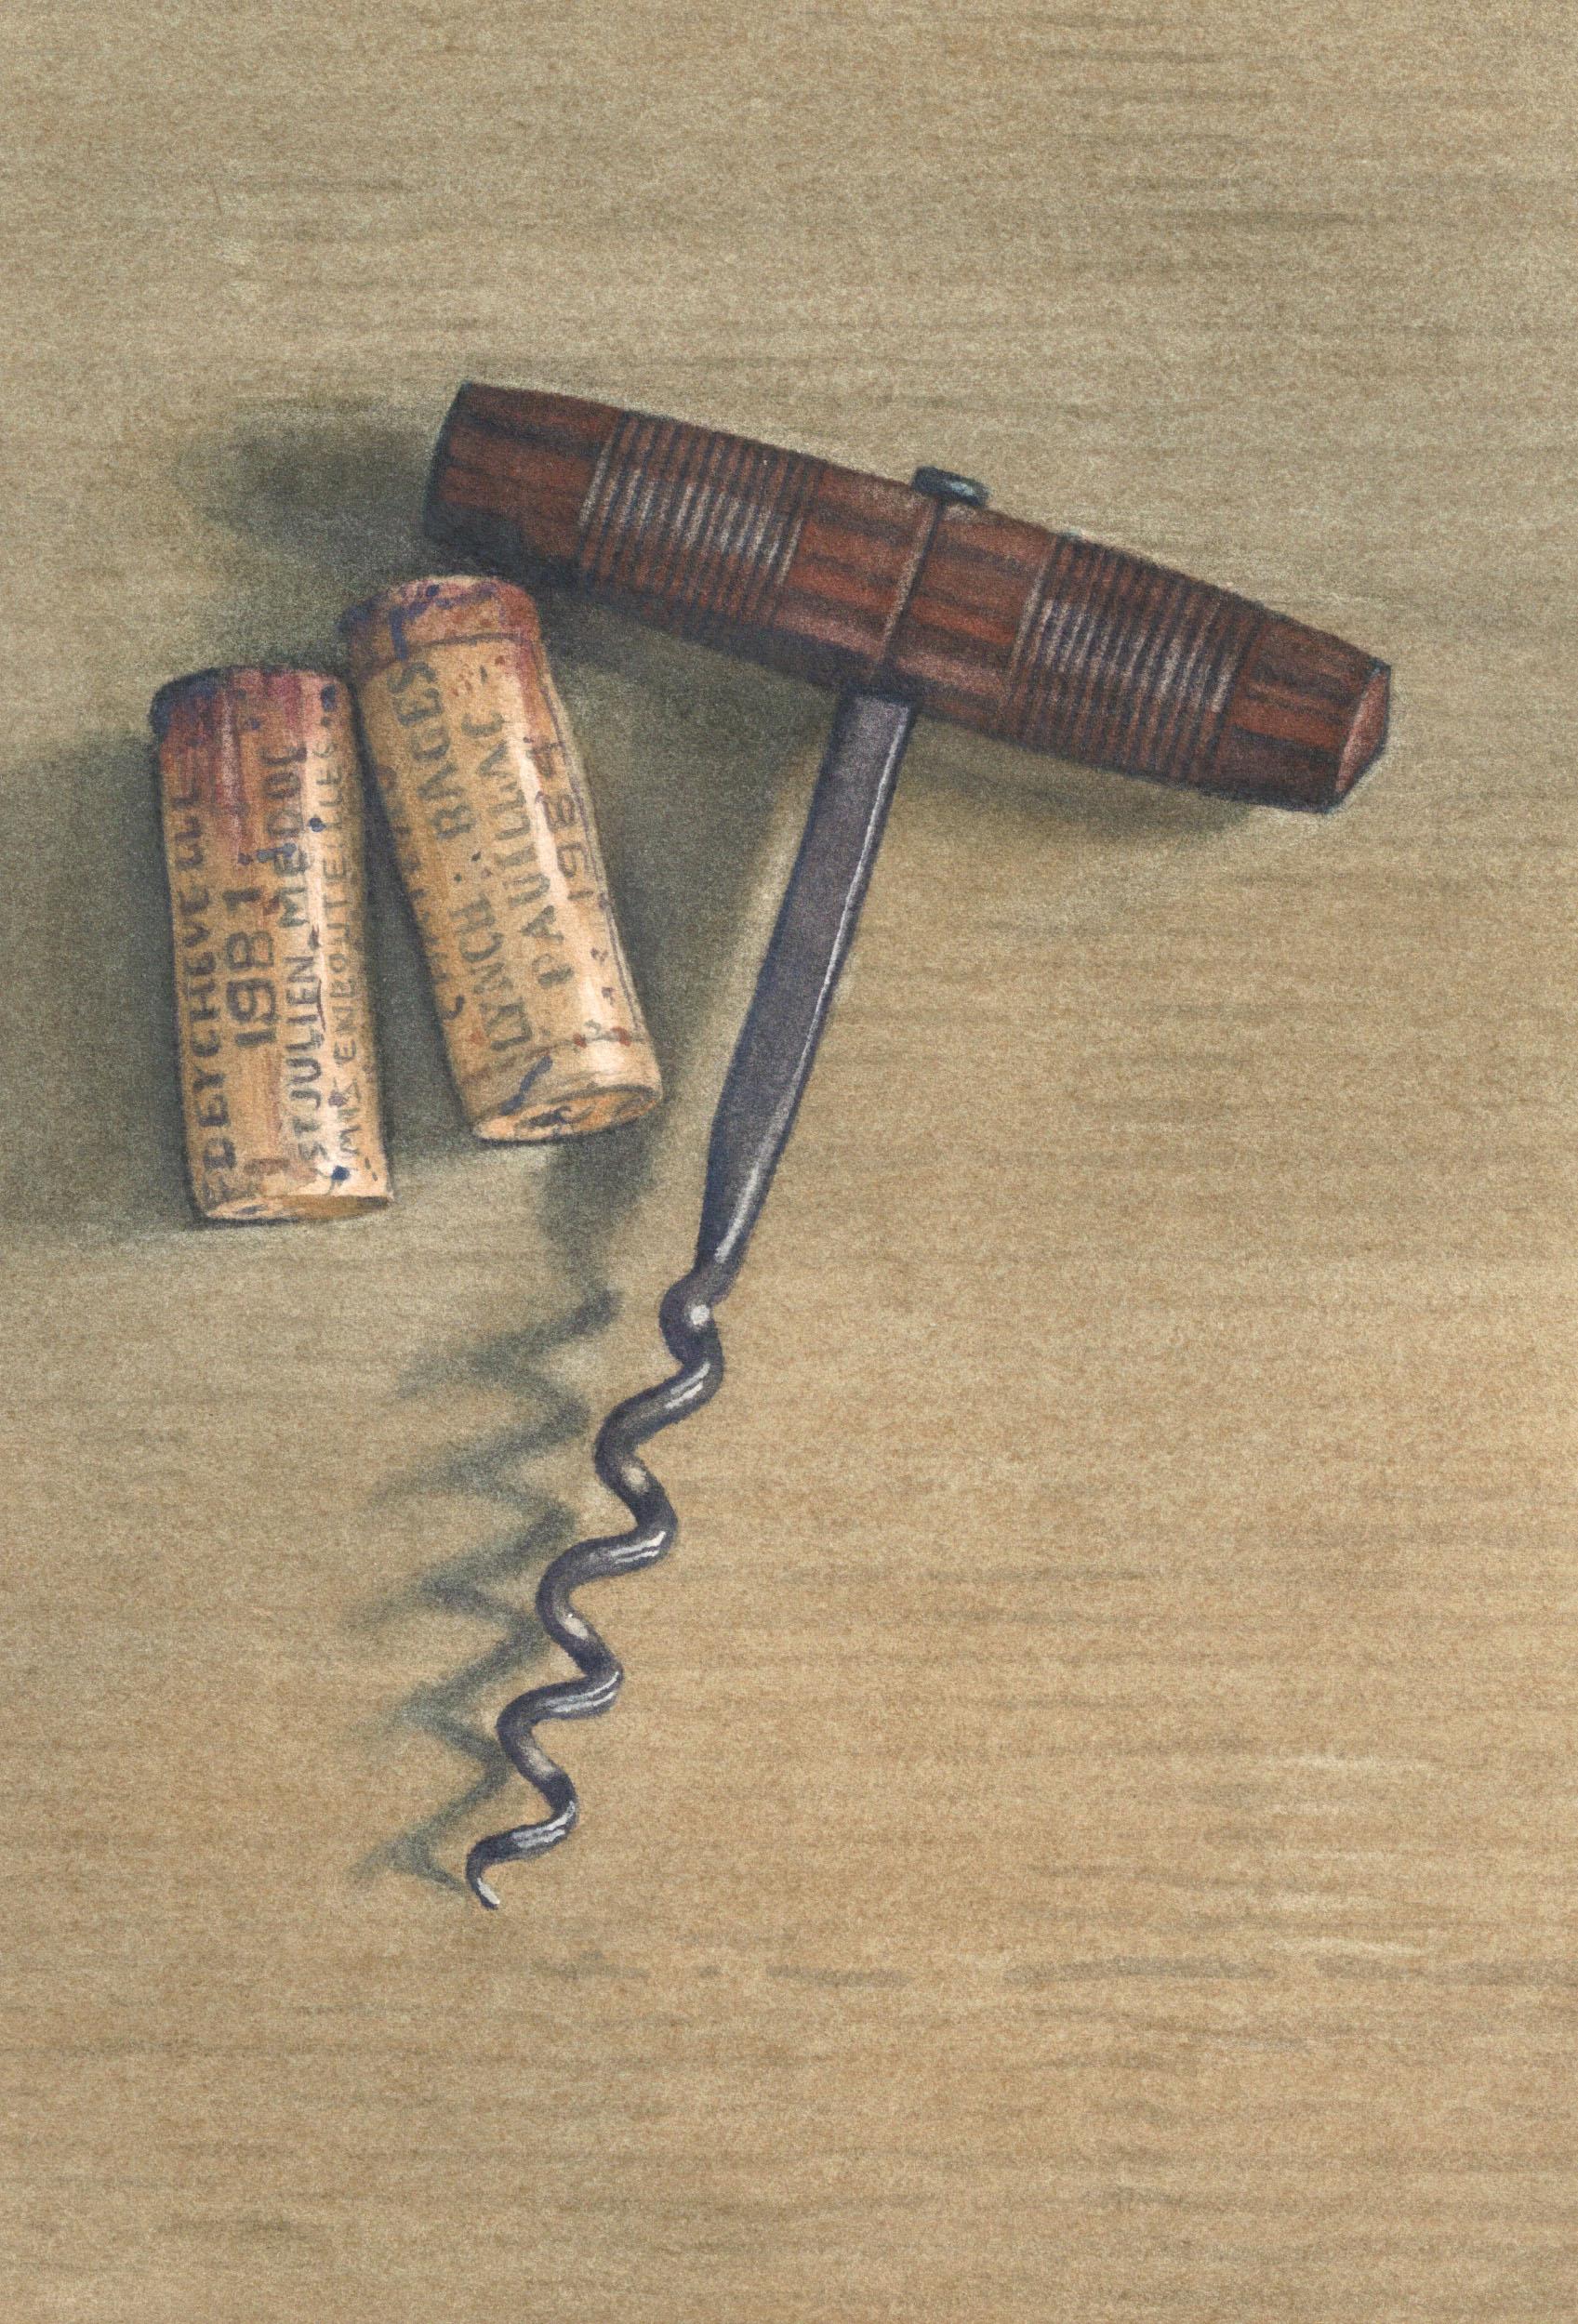 Corks and corkscrew 21 x 15cm